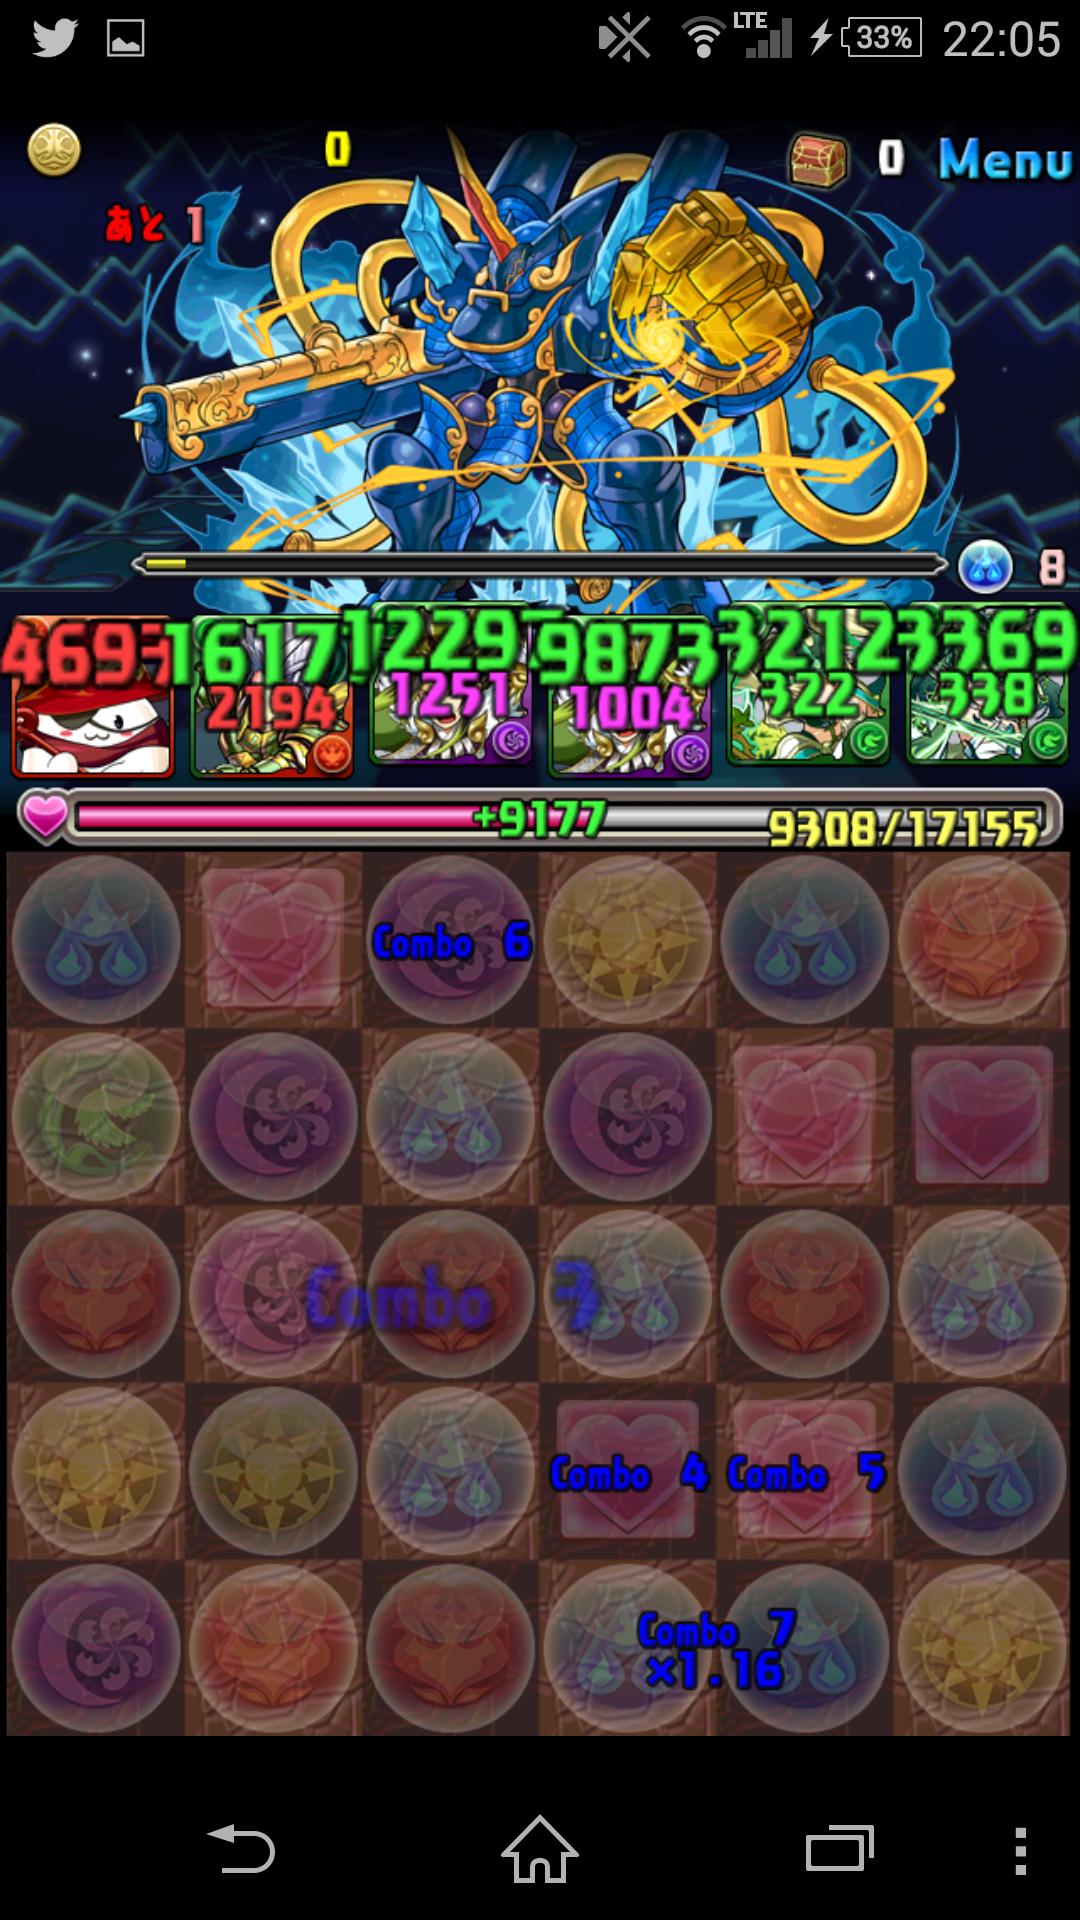 Screenshot_2015-02-20-22-05-30.png